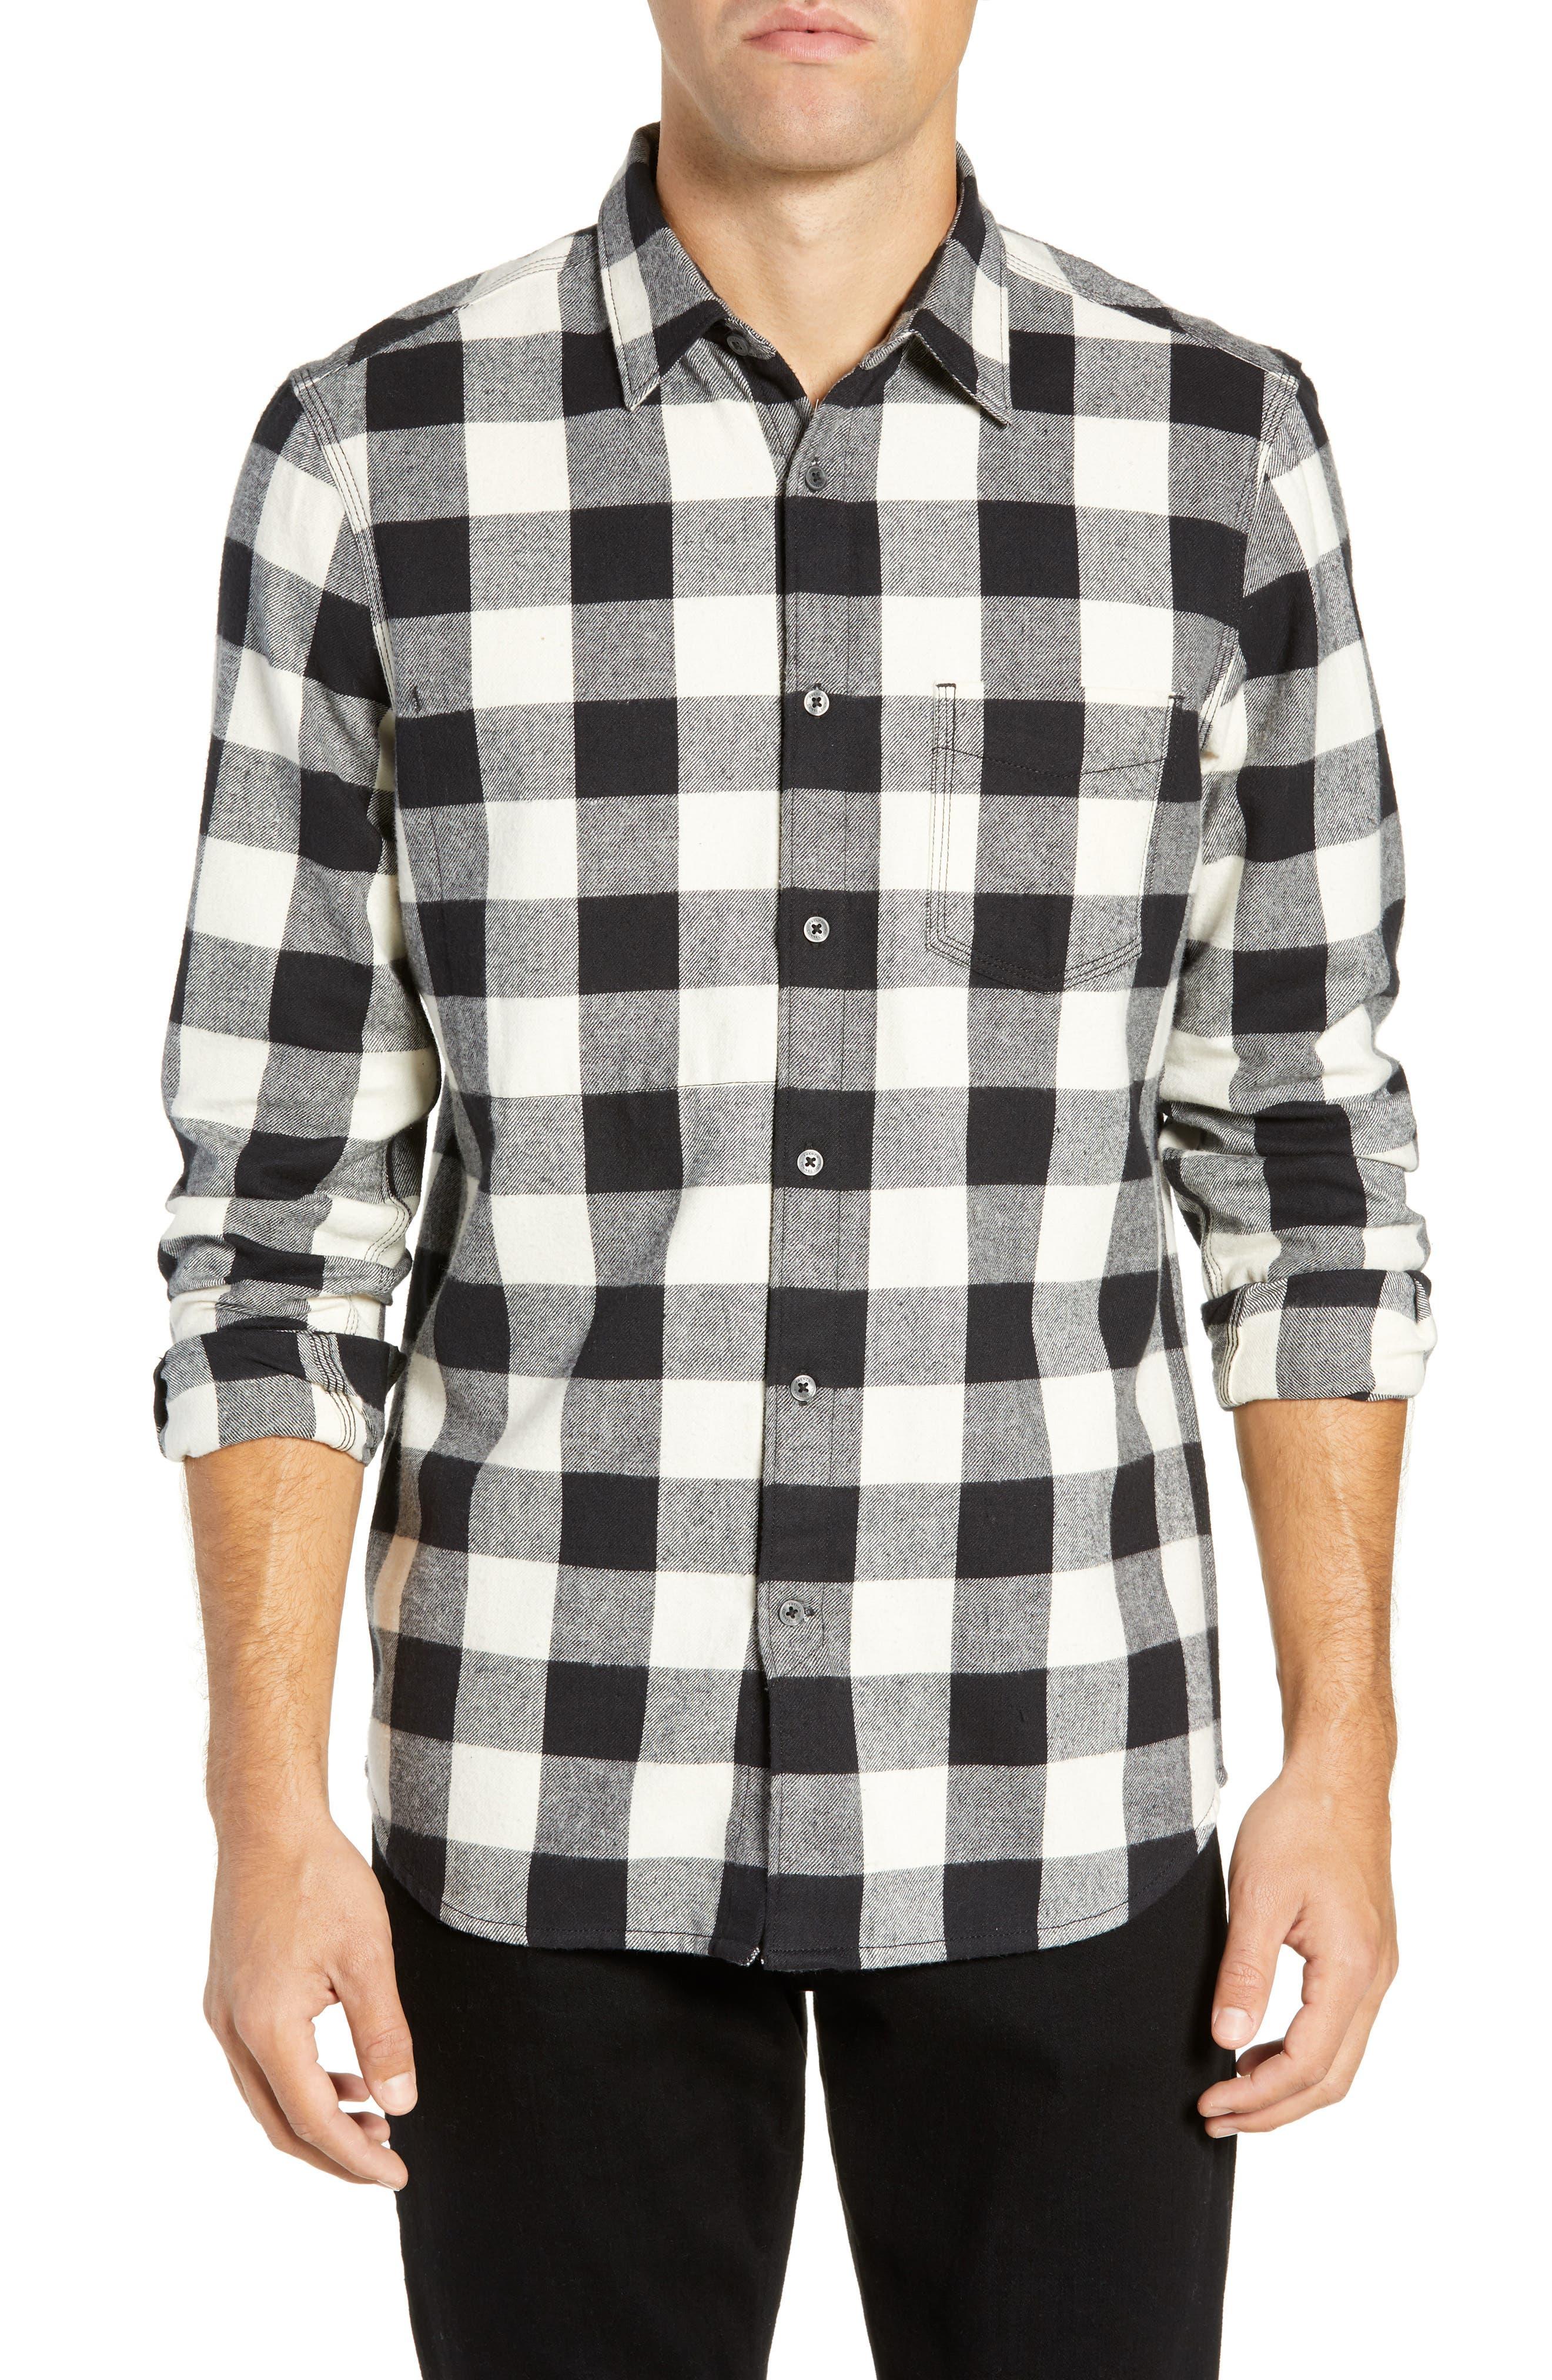 Kahama Regular Fit Flannel Sport Shirt,                         Main,                         color, BLACK WHITECAP GREY